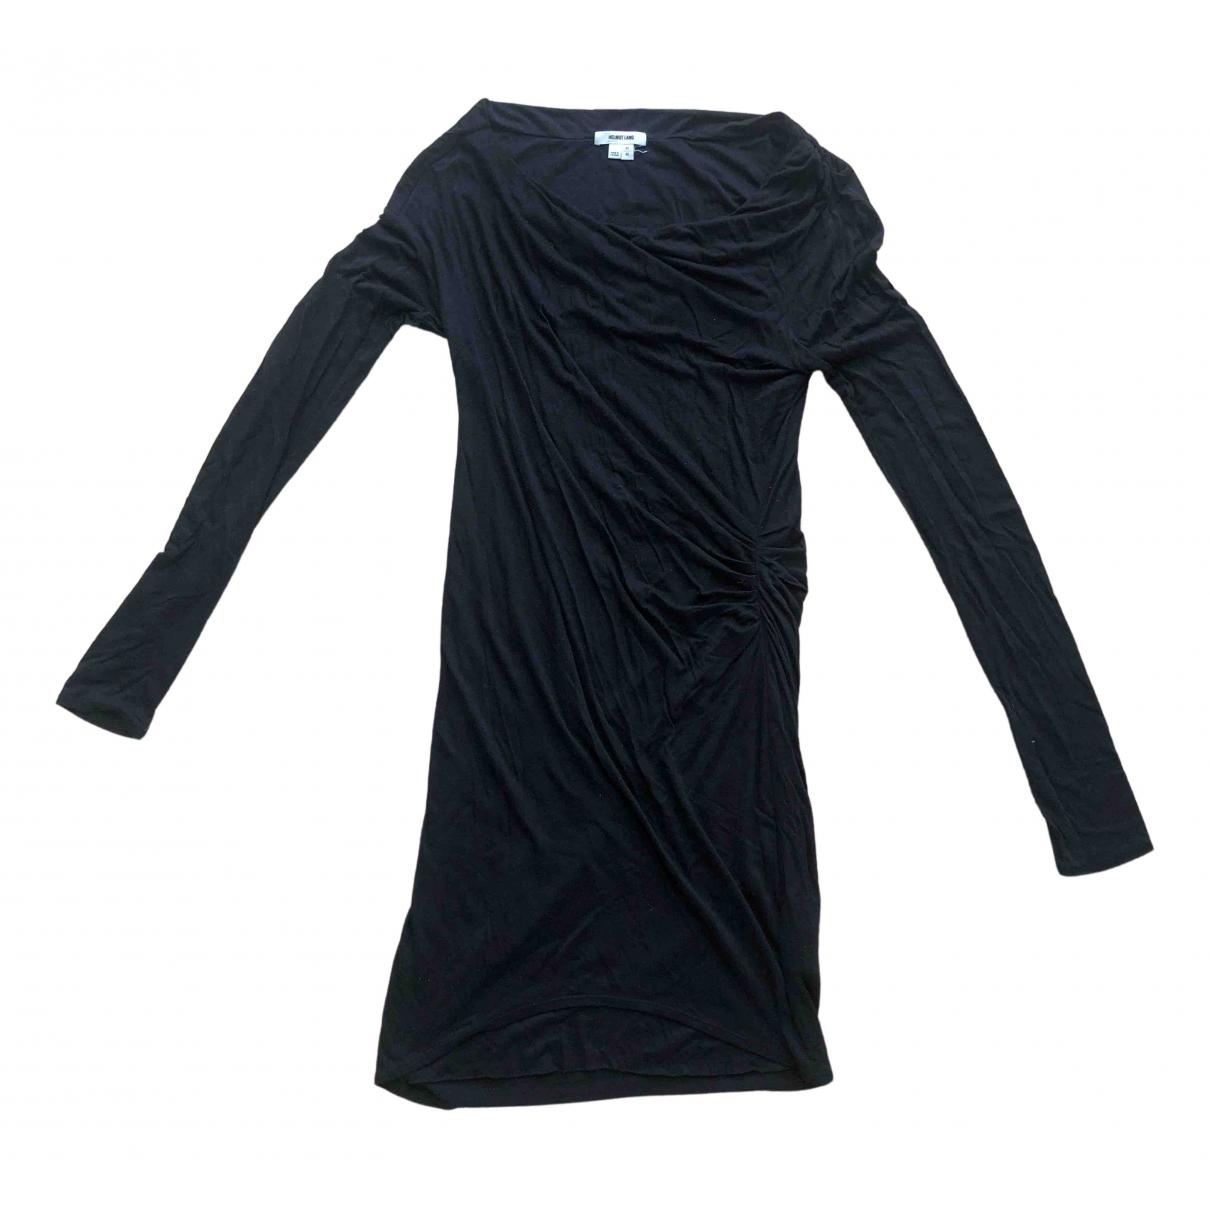 Helmut Lang N Black Cotton - elasthane dress for Women M International